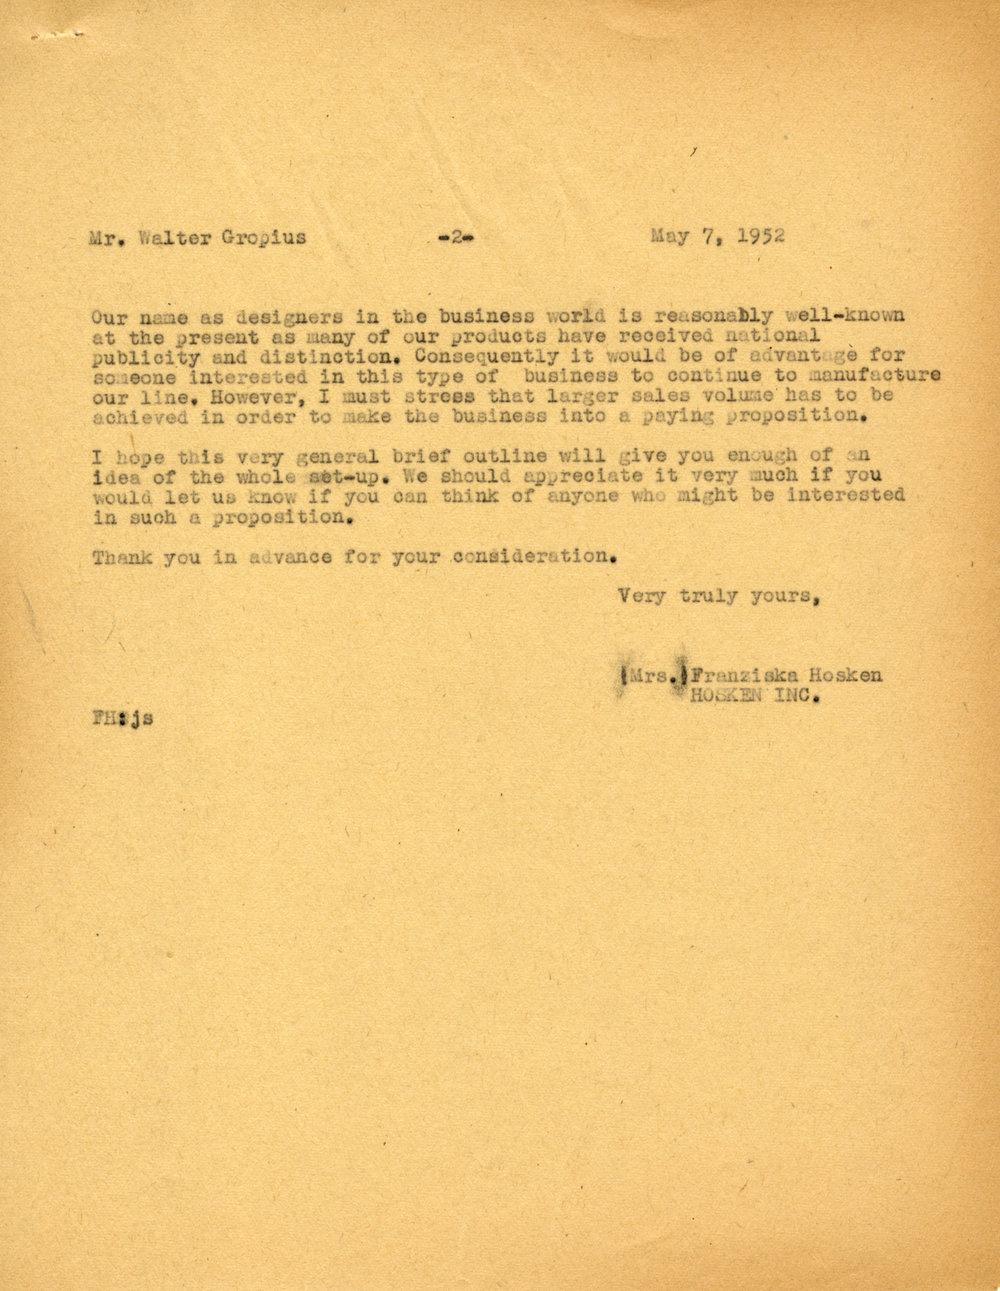 Correspondence between Fran Hosken and Walter Gropius, May 7, 1952. Frances Loeb Library Special Collections, Harvard Graduate School of Design.